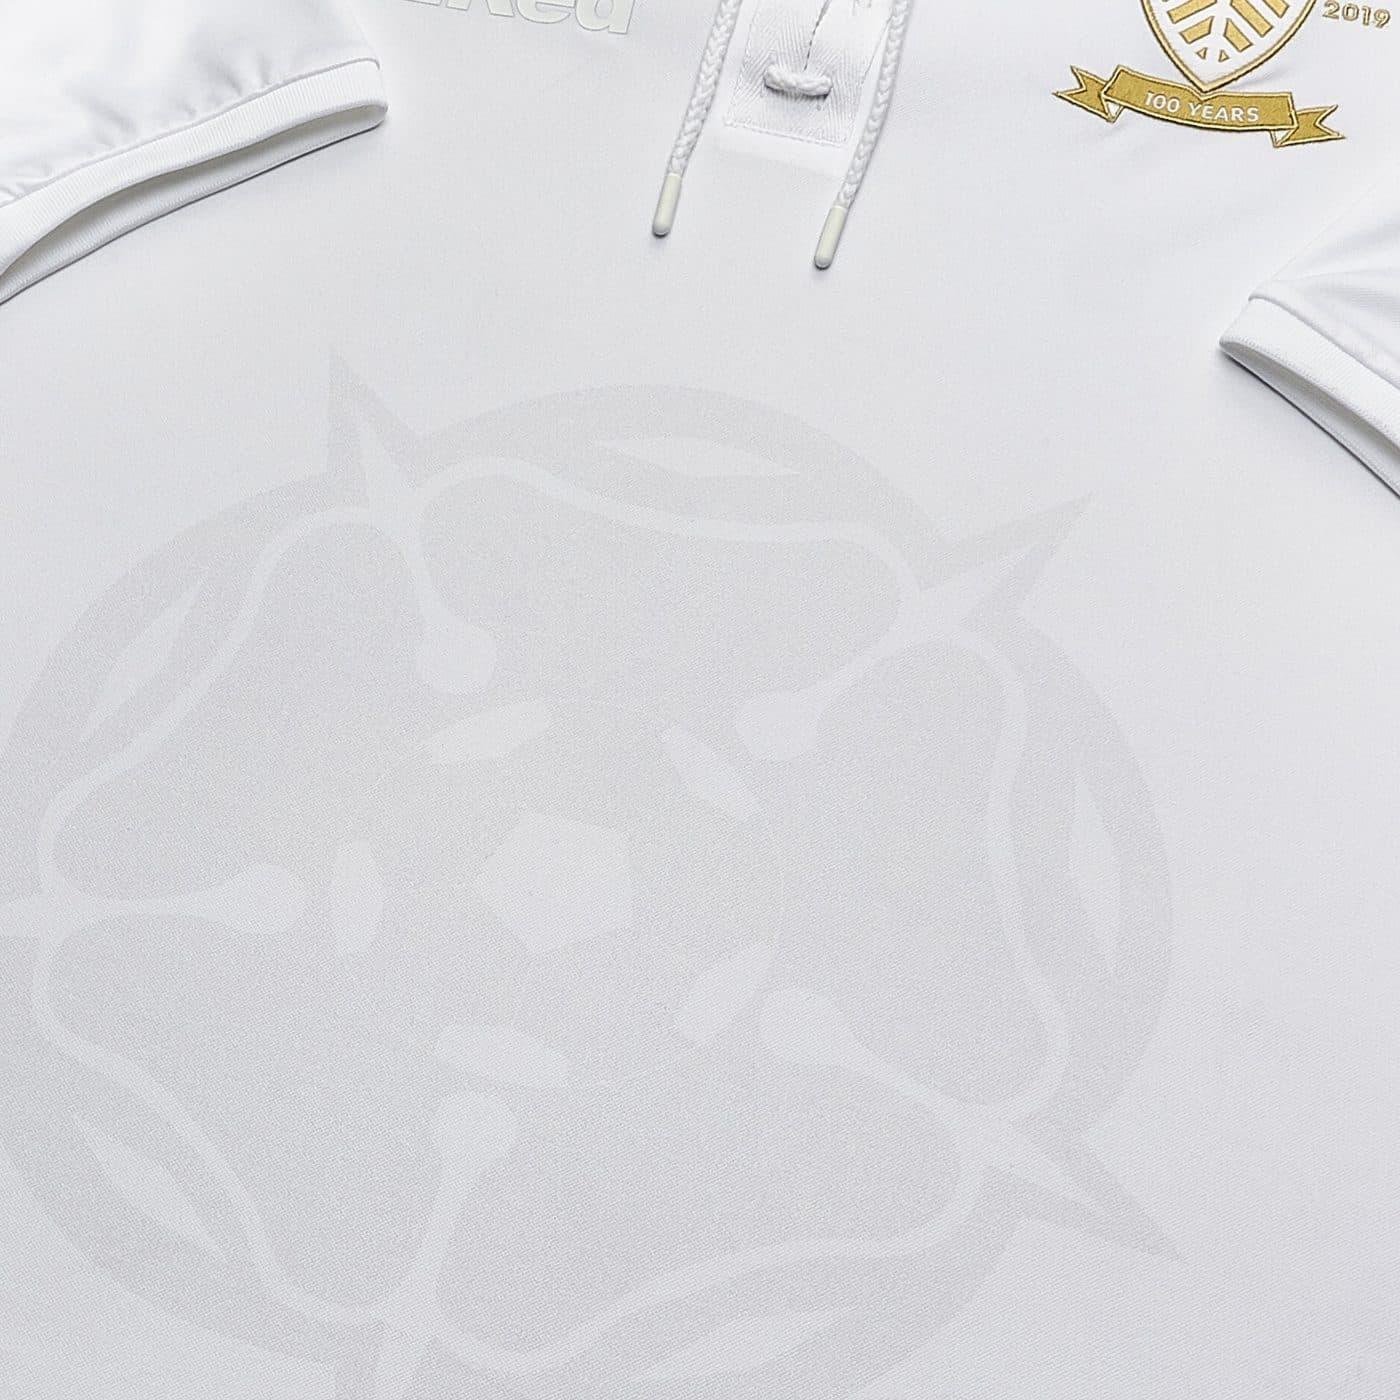 maillot-leeds-united-100-ans-kappa-1